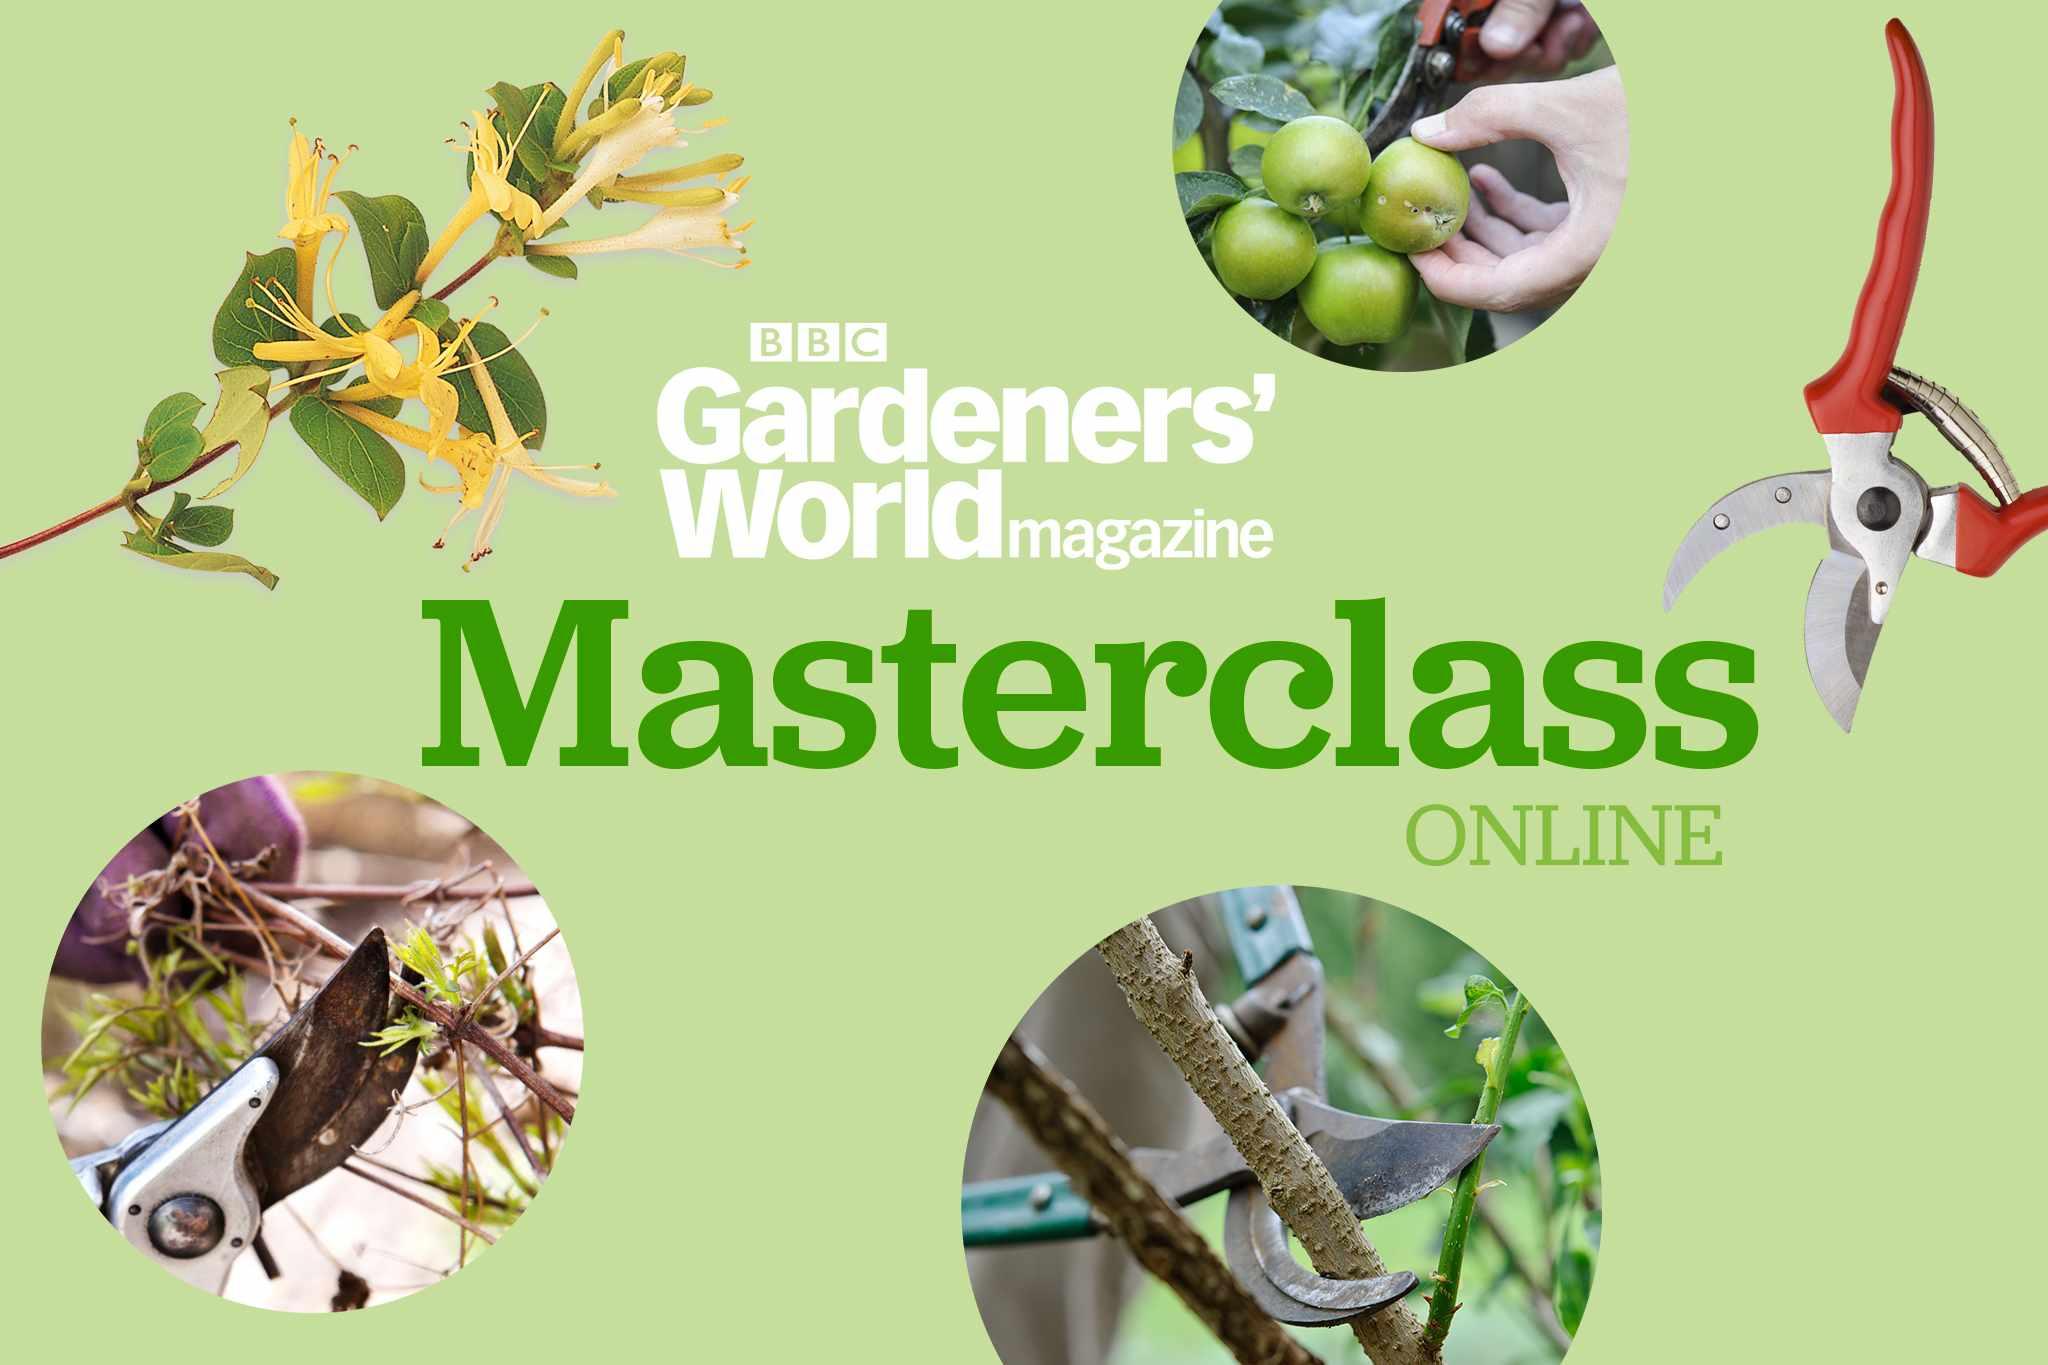 BBC Gardeners' World Magazine Masterclass Online: Autumn Pruning